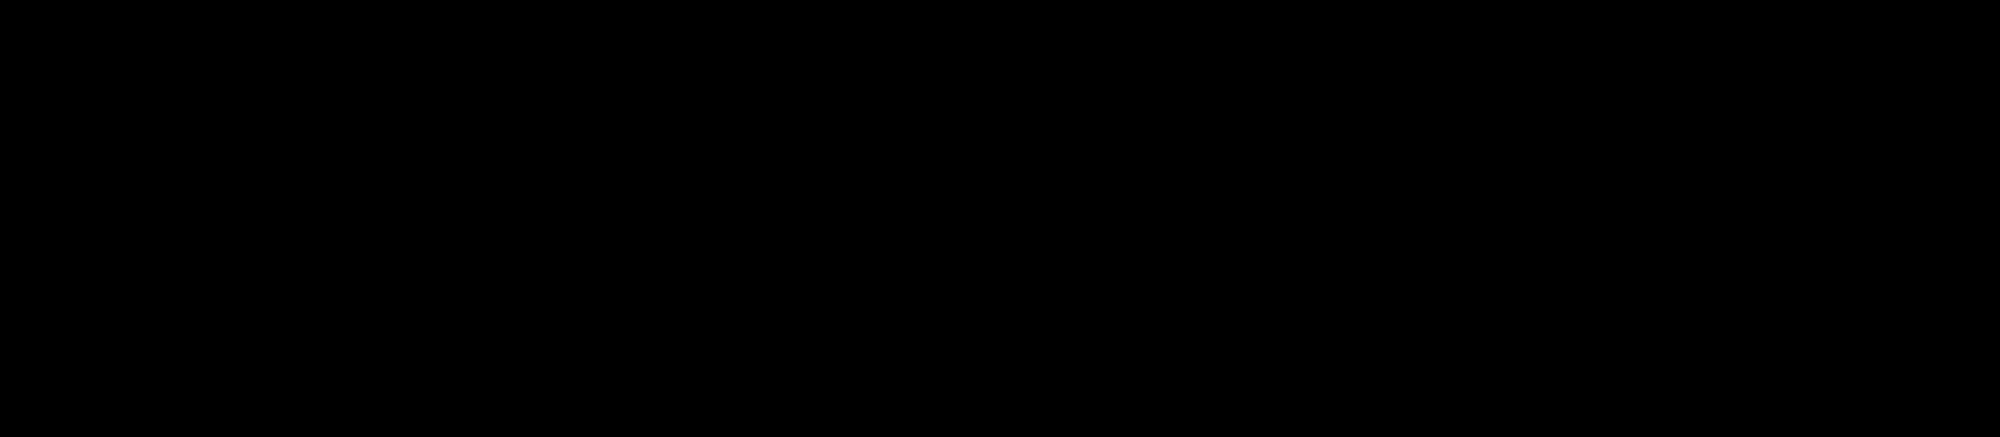 FSB Türdrücker Fsb 06 1146 011 8 Mm-4Kt.,Stifteinstand 41 Mm,Edelstahl |  IGT-Tech